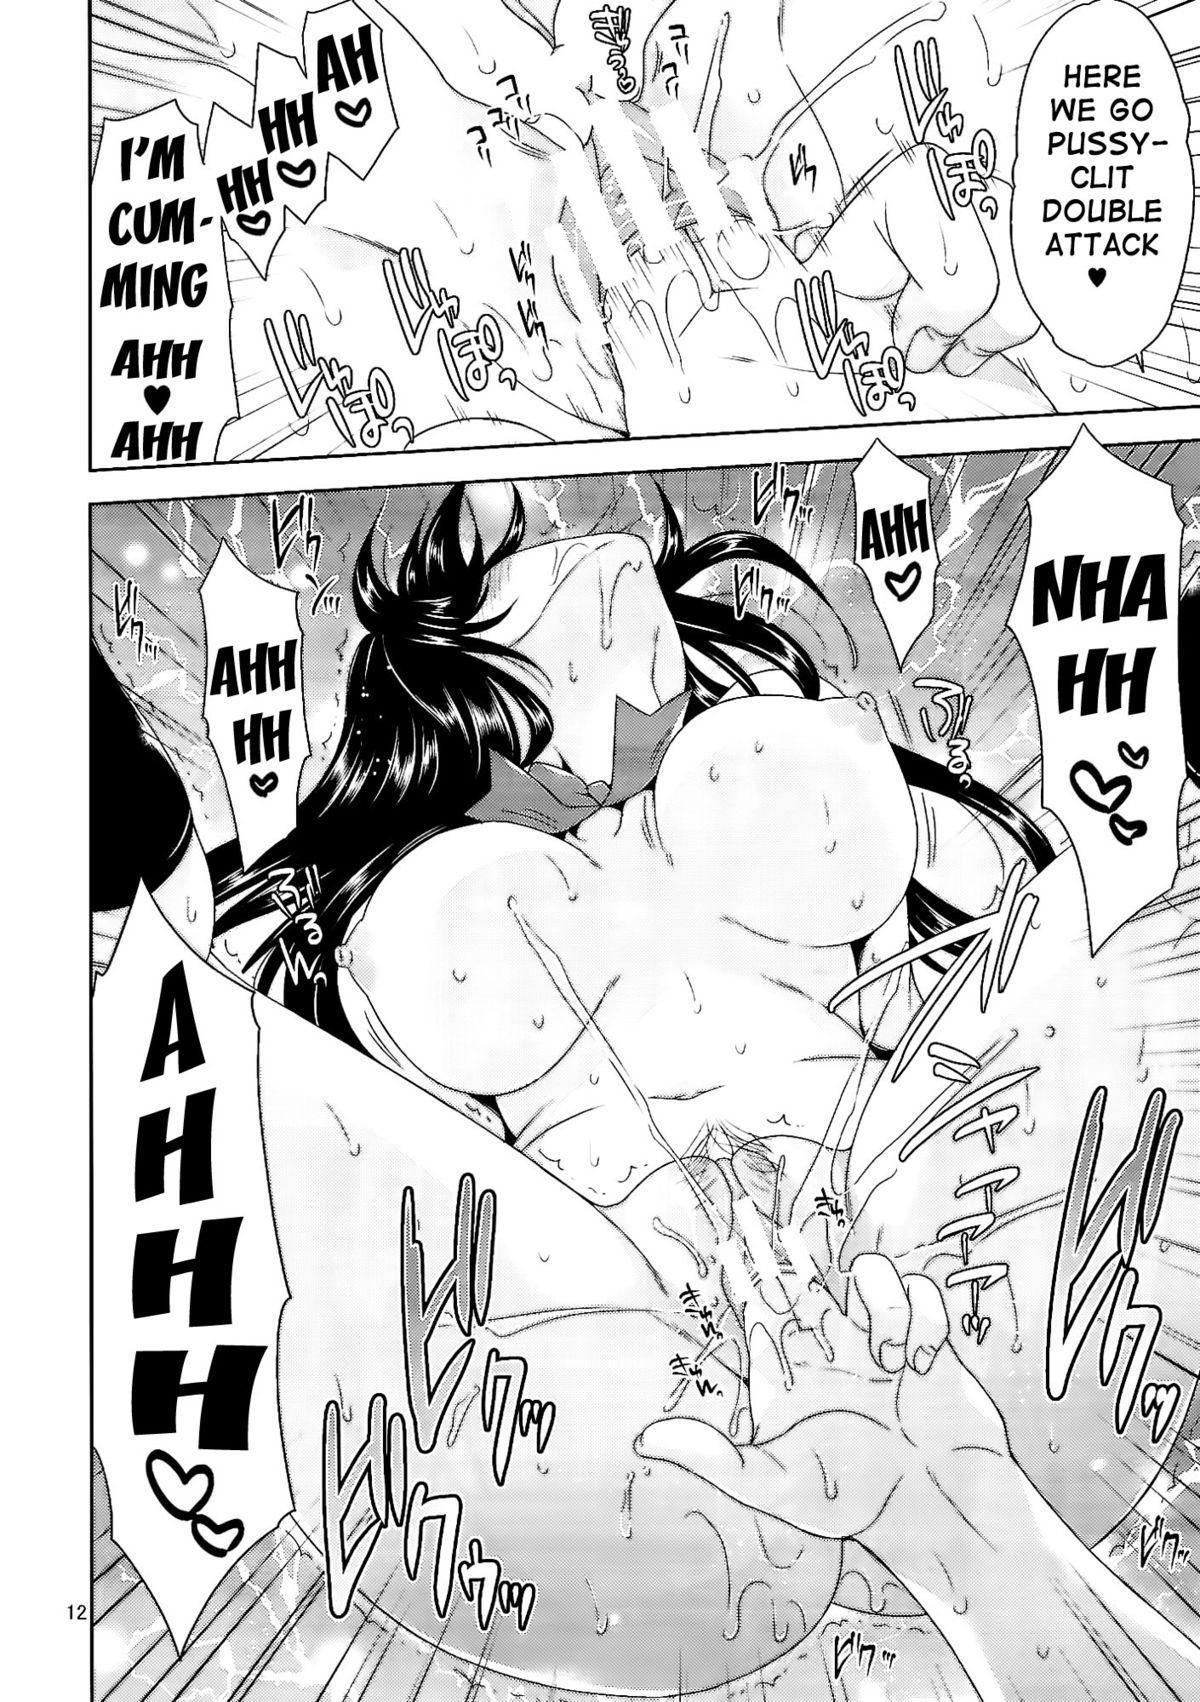 (C86) [Sorairo March (Narusawa Sora)] Eronama Idol Kotegawa - Rankou Off-kai | Erotic Idol Kotegawa - Offline Orgy Meeting (To LOVE-Ru) [English] {doujin-moe.us} 10